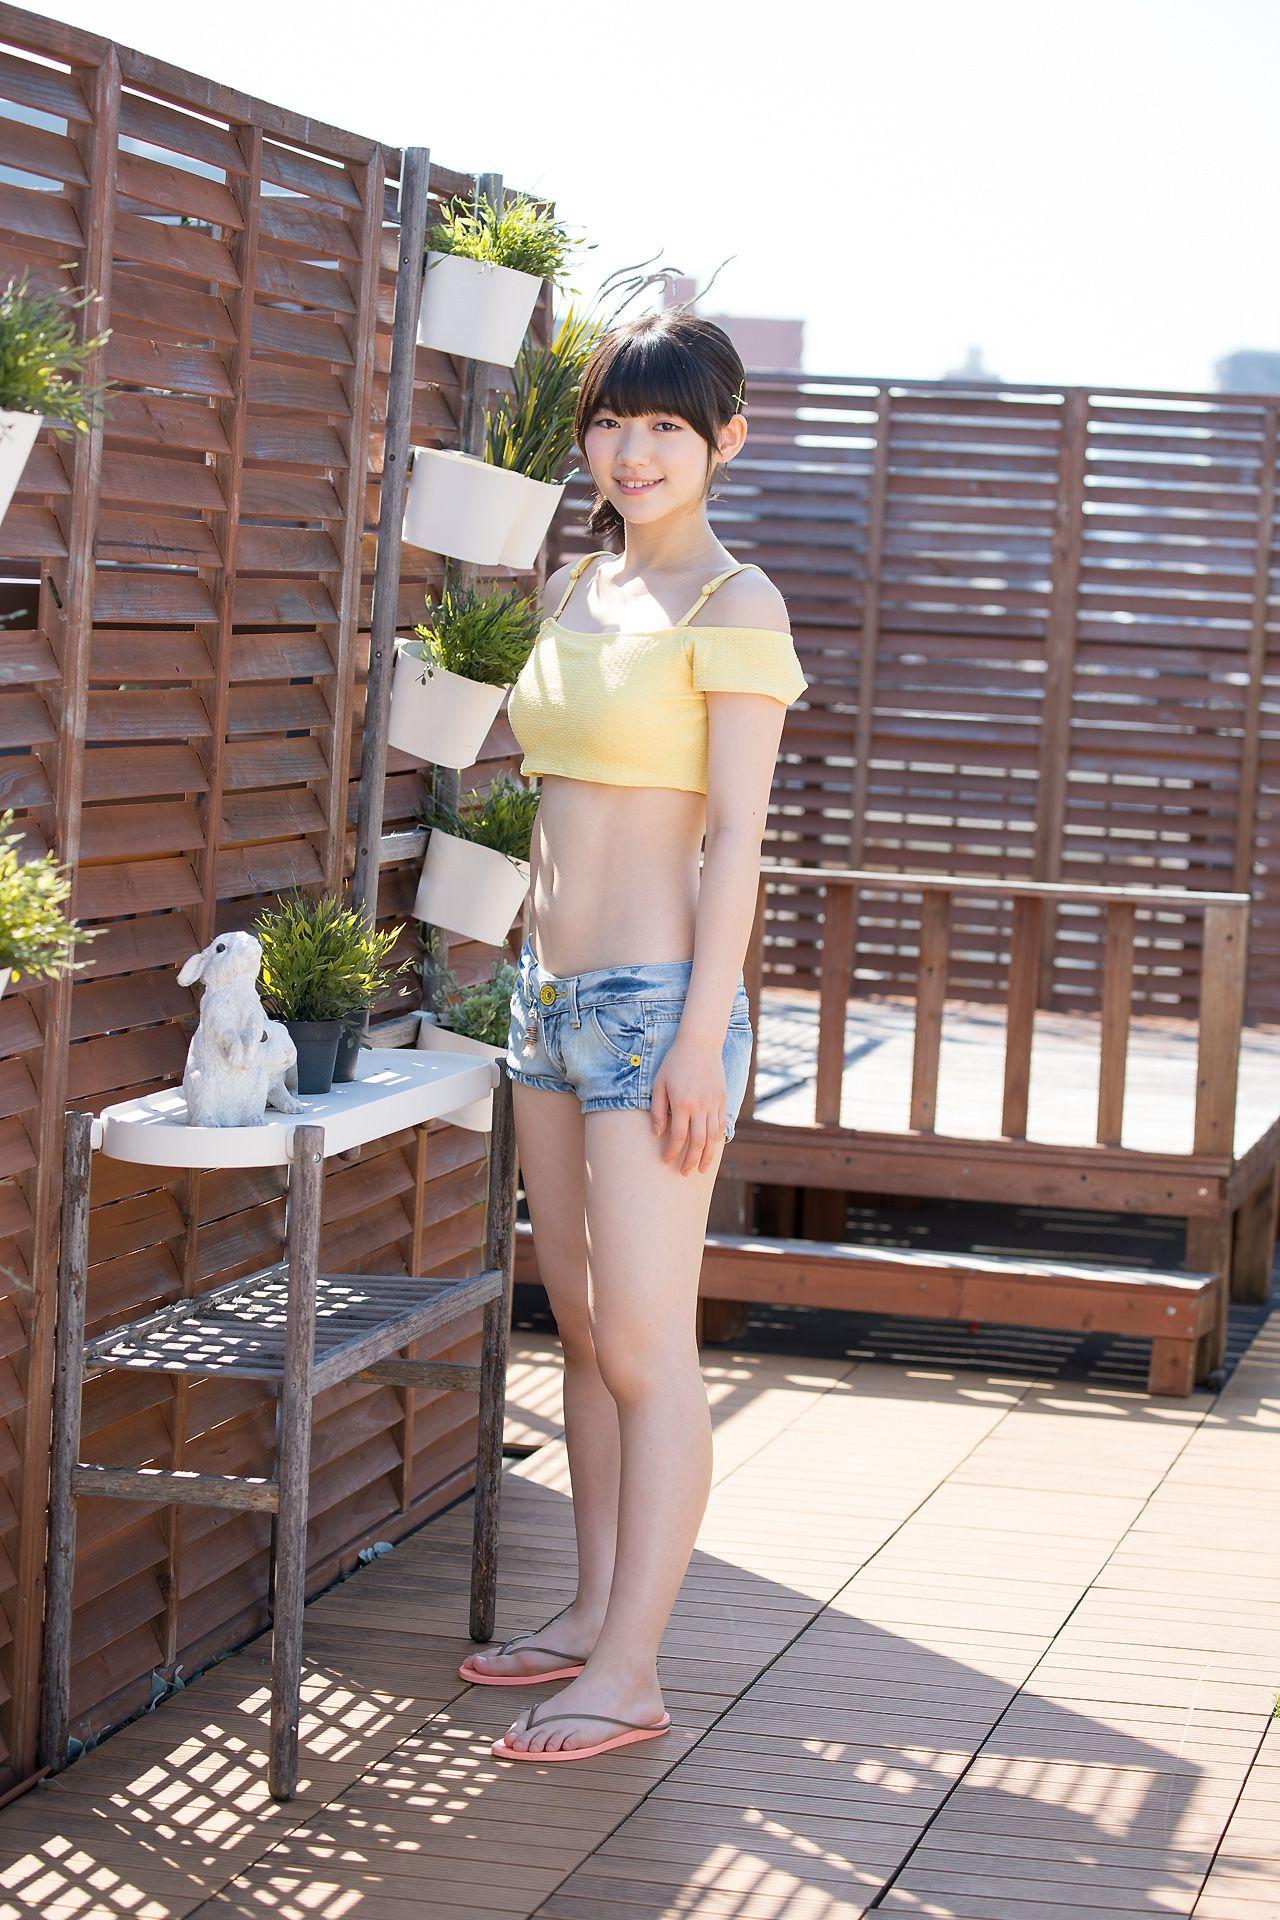 VOL.621 [Minisuka.tv]热裤阳光背心:沢村りさ超高清写真套图(55P)